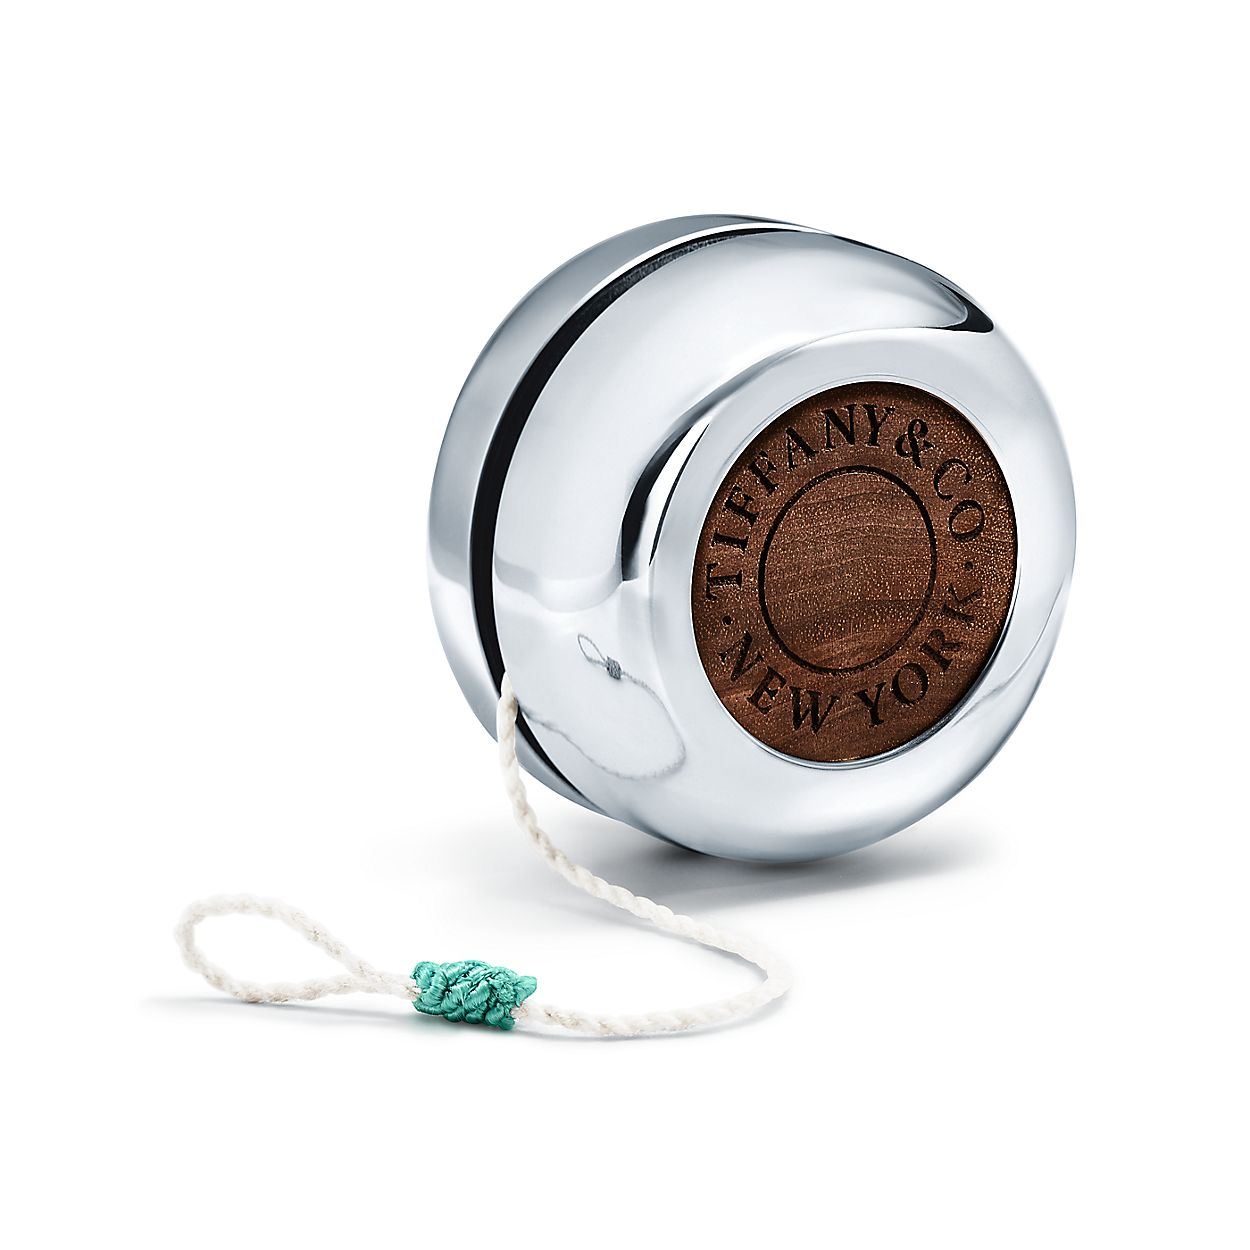 йо-йо из ореха и серебра, Tiffany & Co